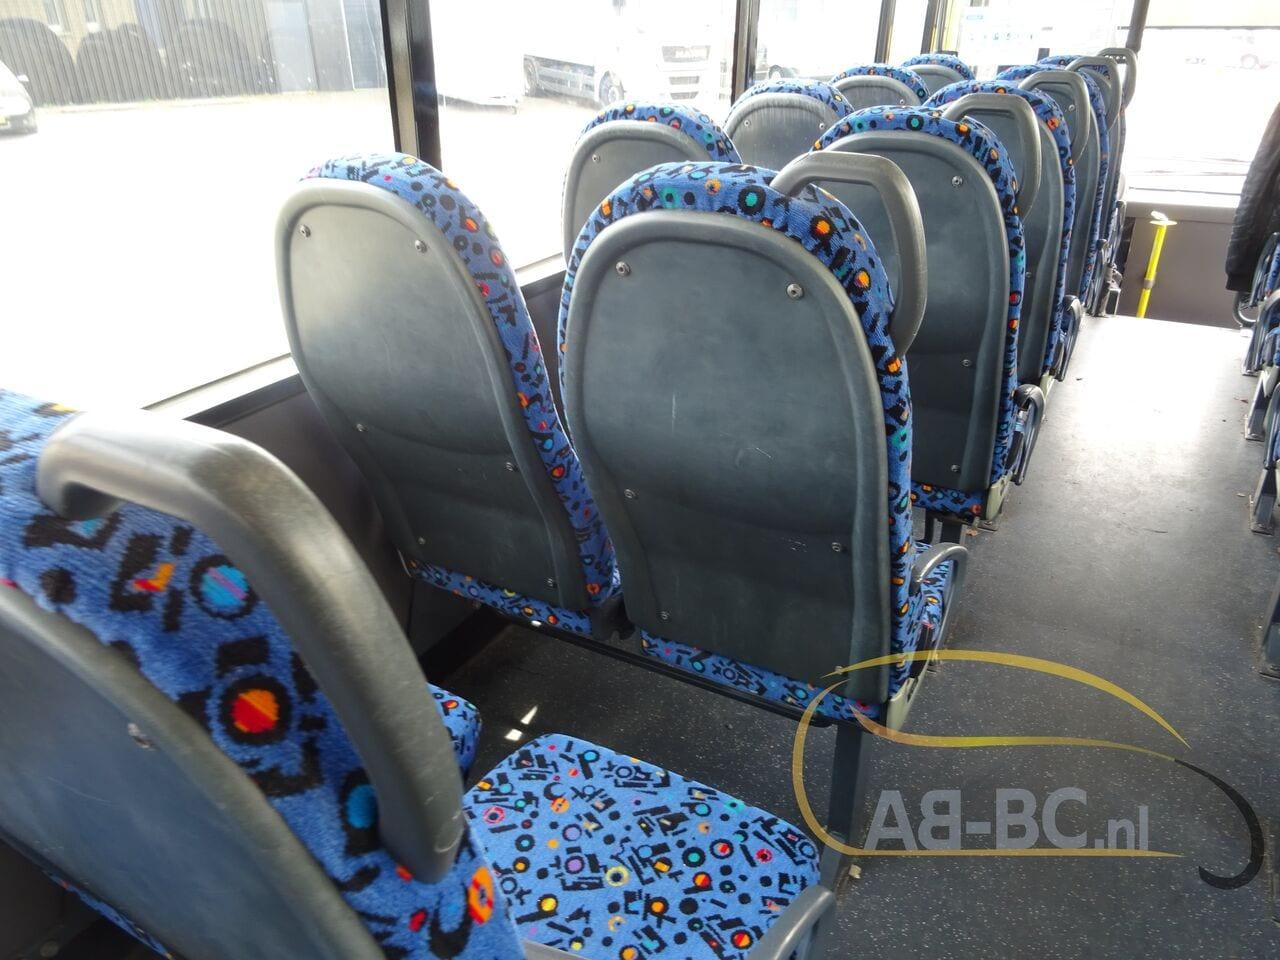 interurban-busMAN-Fast-64-seats---1619620063708326399_big_e882c8fb2b4ceed98e146d37df039426--21042817163019598600